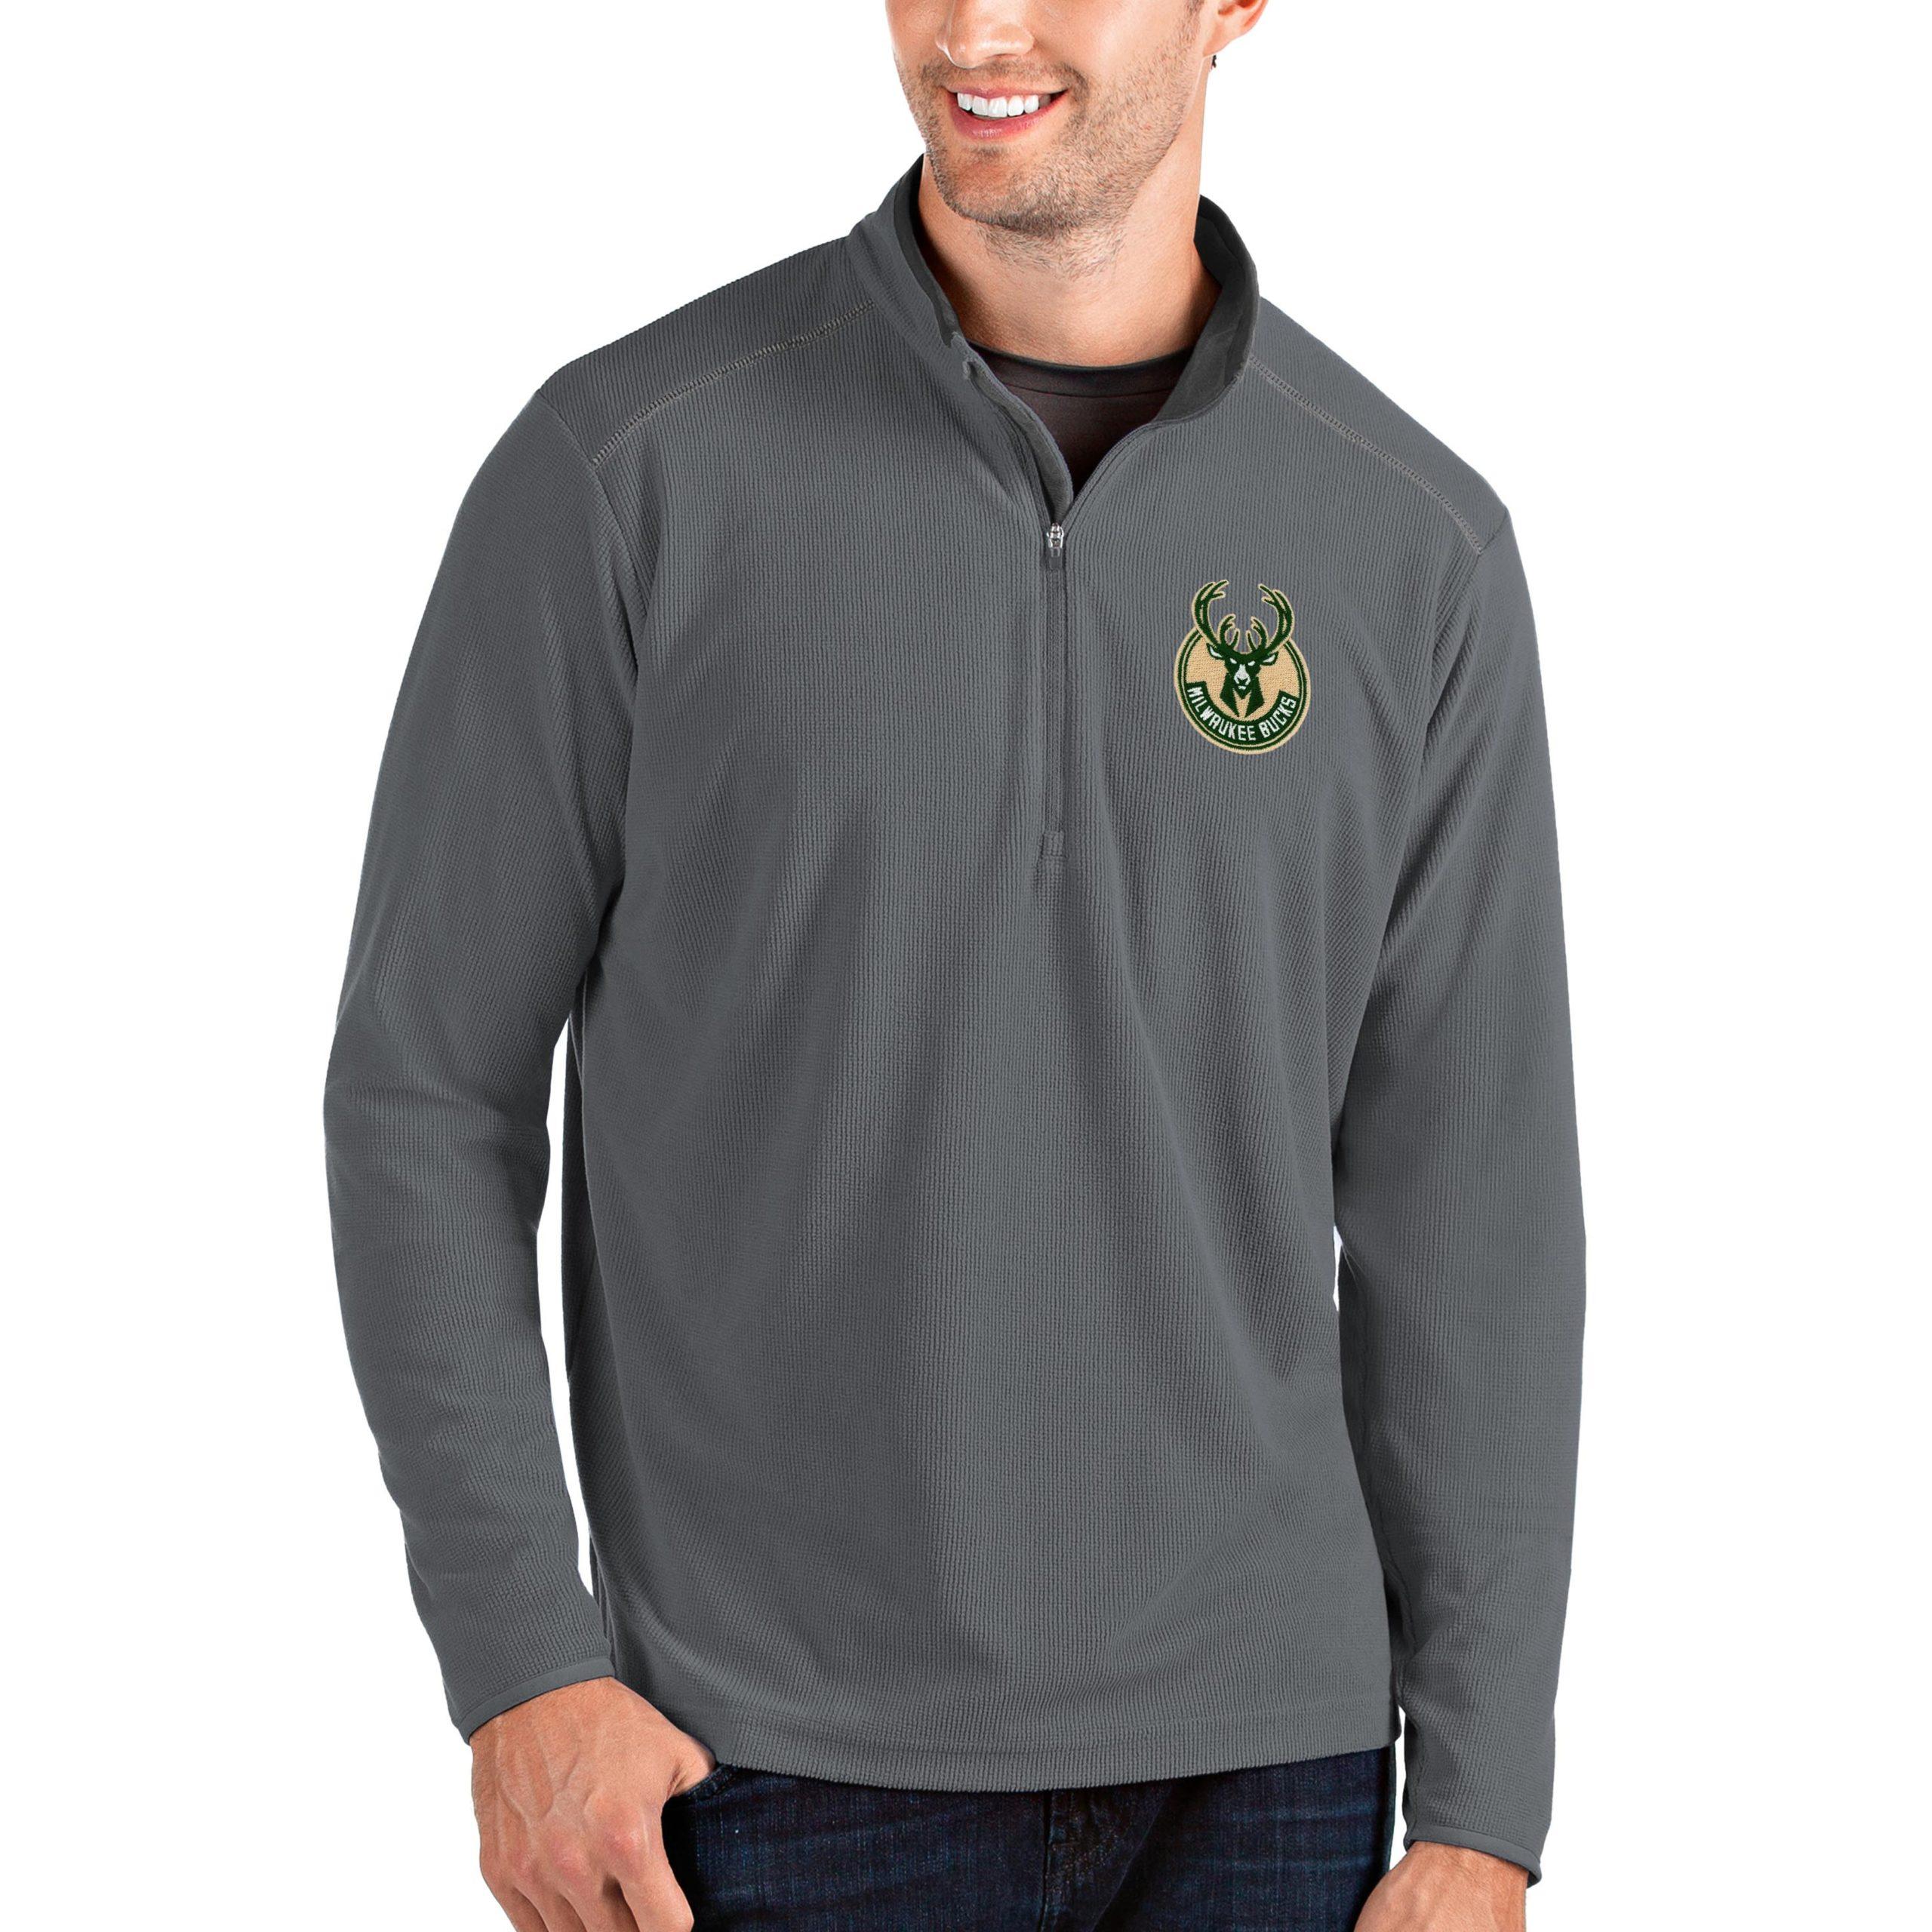 Milwaukee Bucks Antigua Big & Tall Glacier Quarter-Zip Pullover Jacket - Gray/Gray